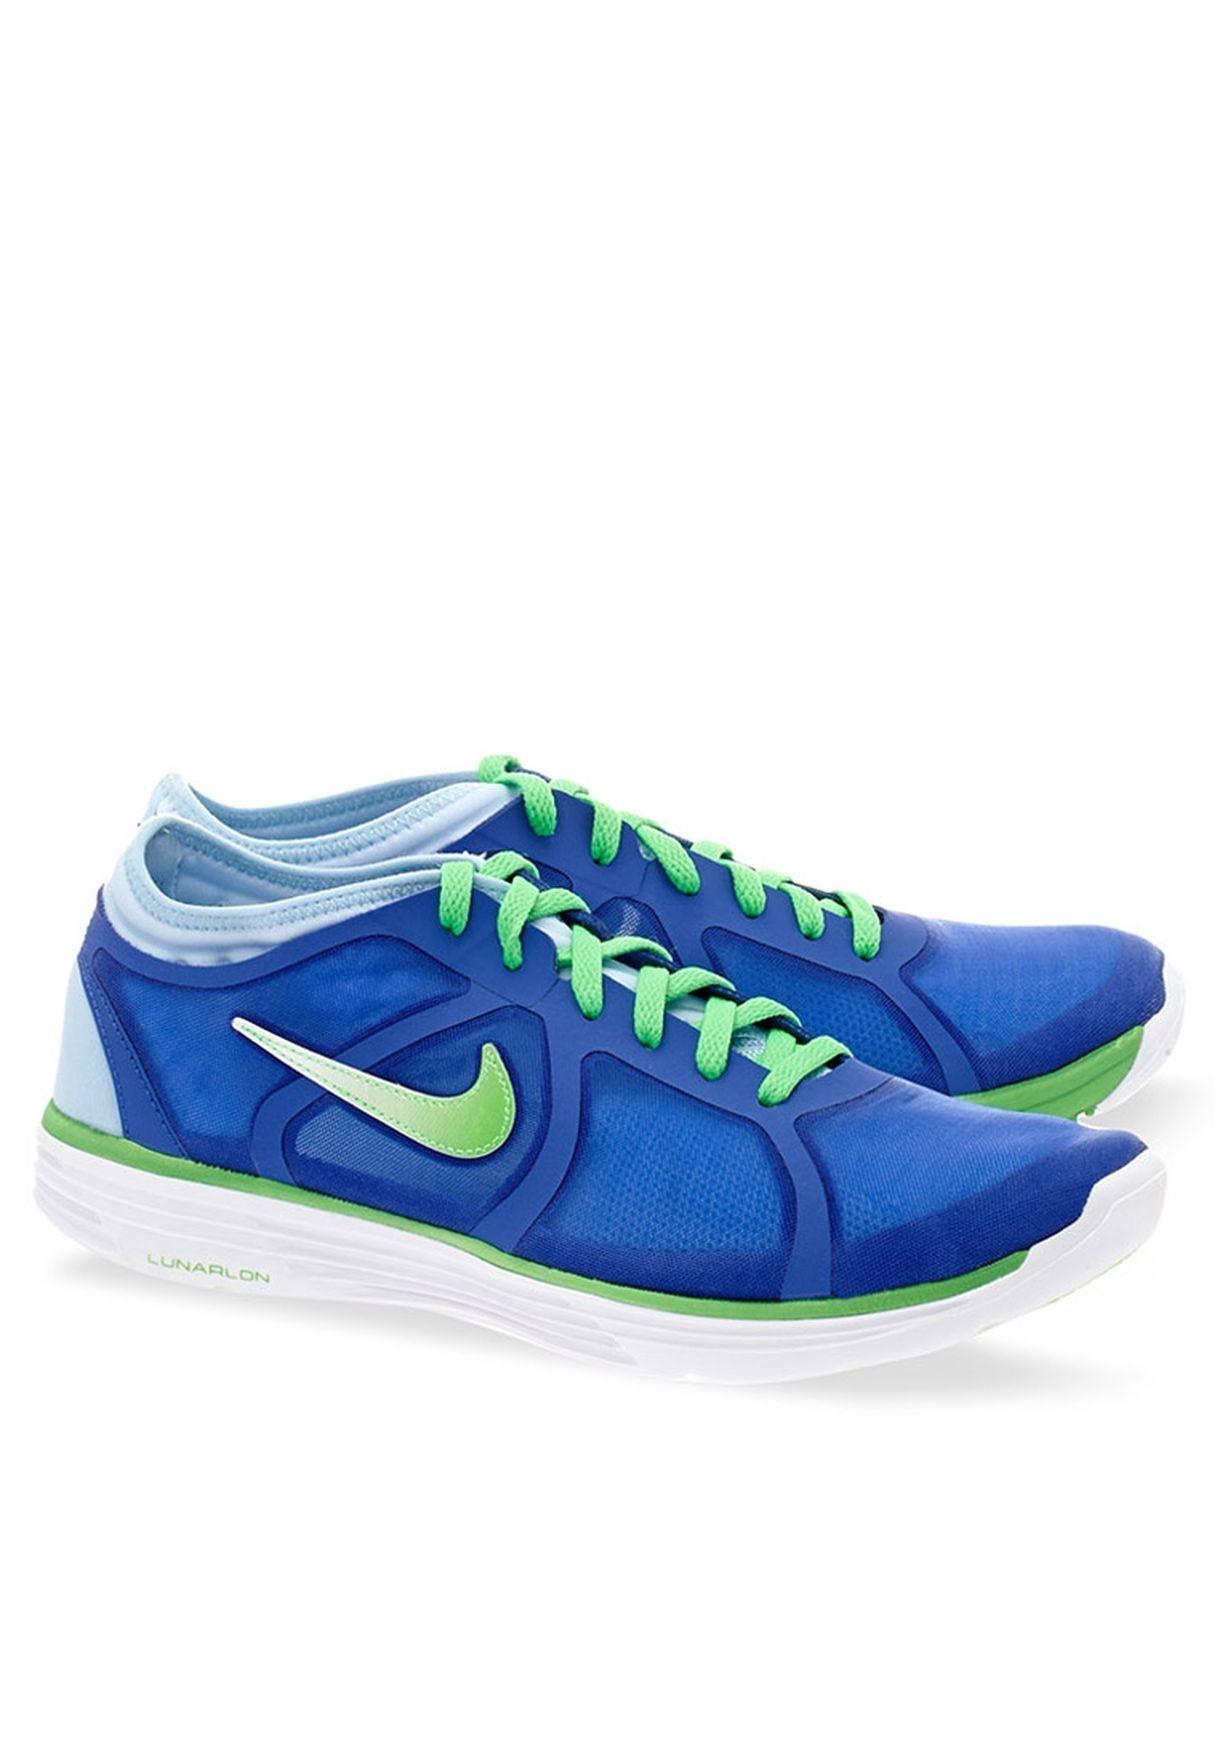 super popular 1d04f aa7c0 Nike Lunarlon Sneakers Tränings Skor Nypris 799 339356467 ᐈ Köp